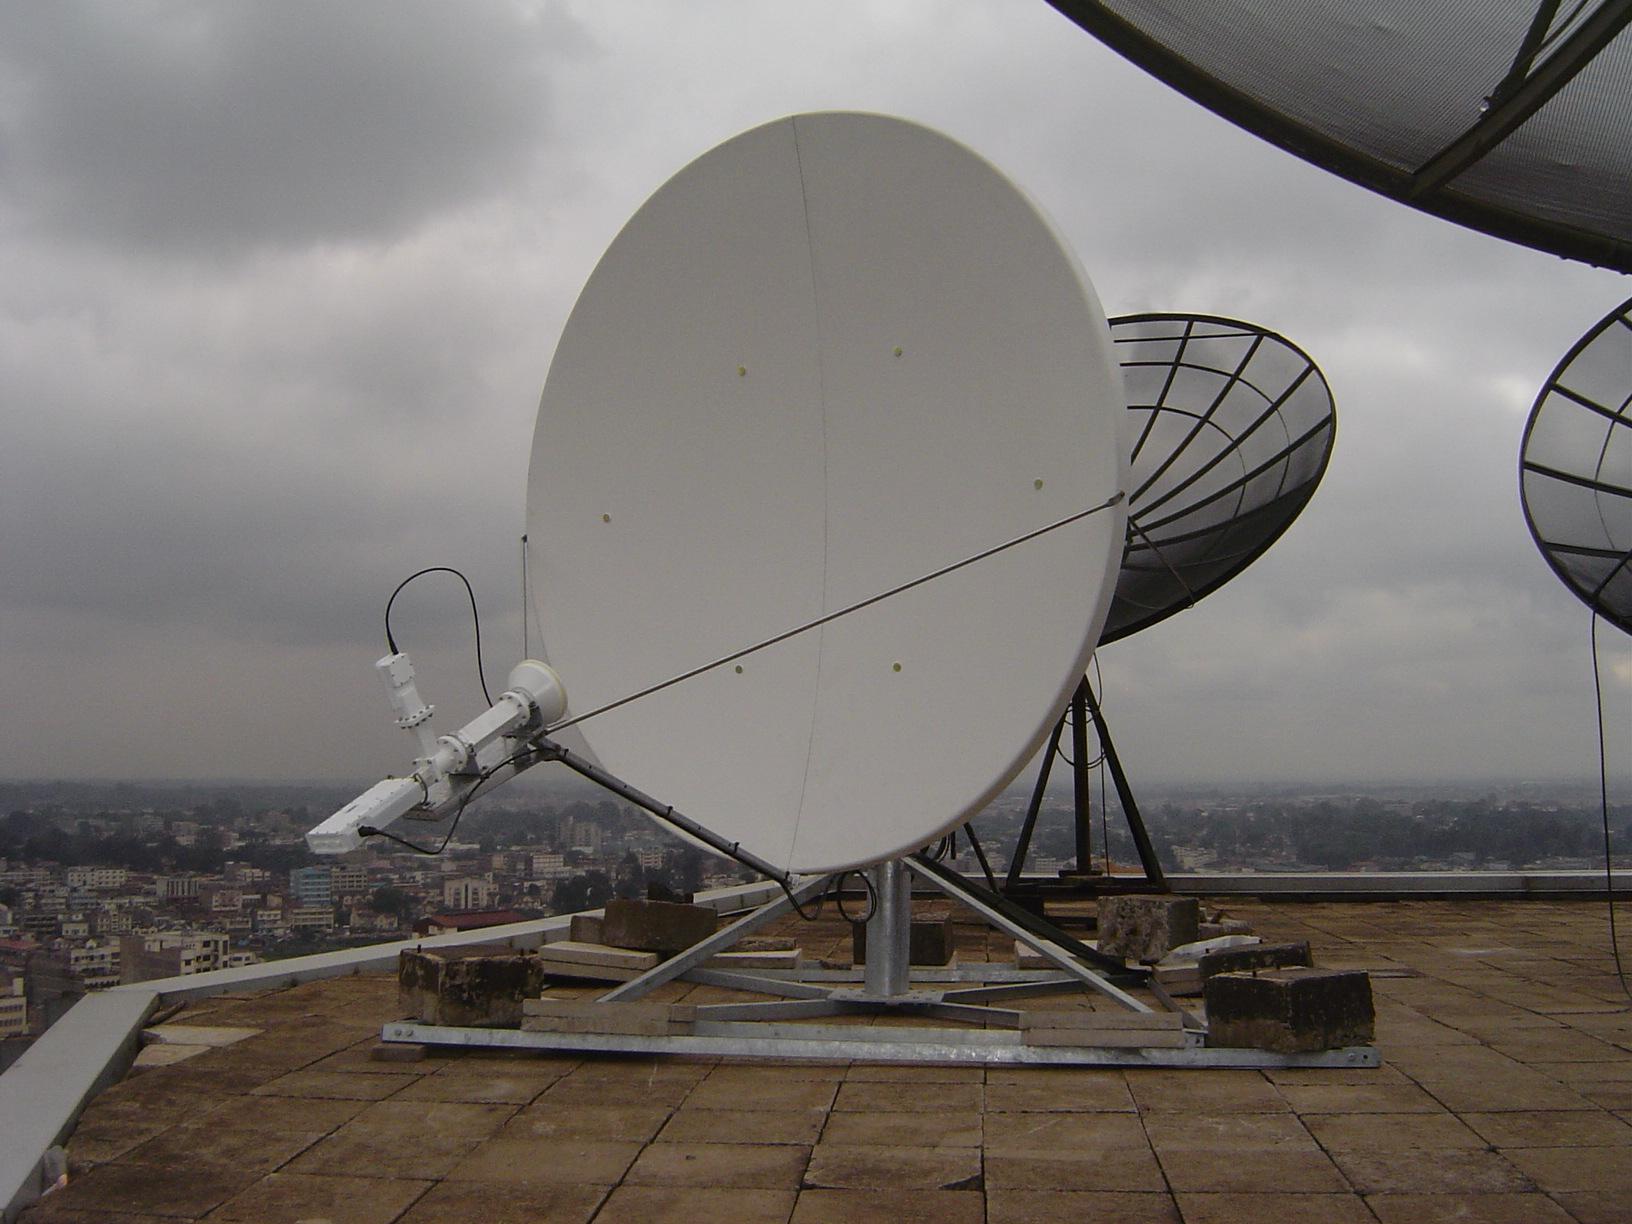 2.4m C-Band in Kenya